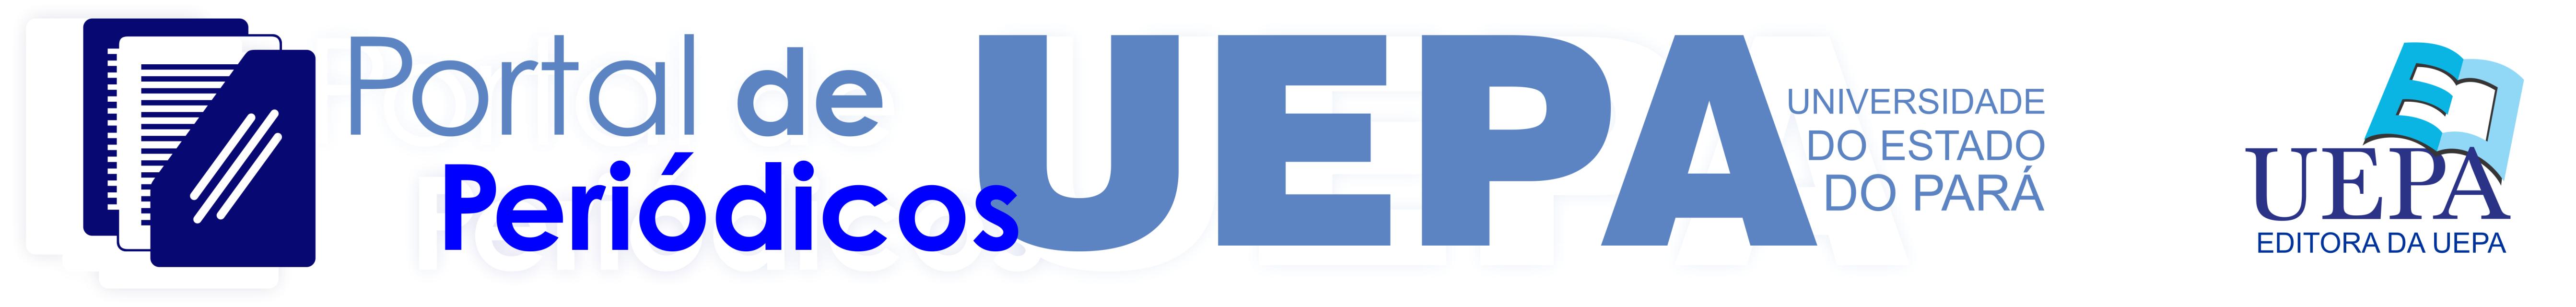 Portal de Periódicos da UEPA